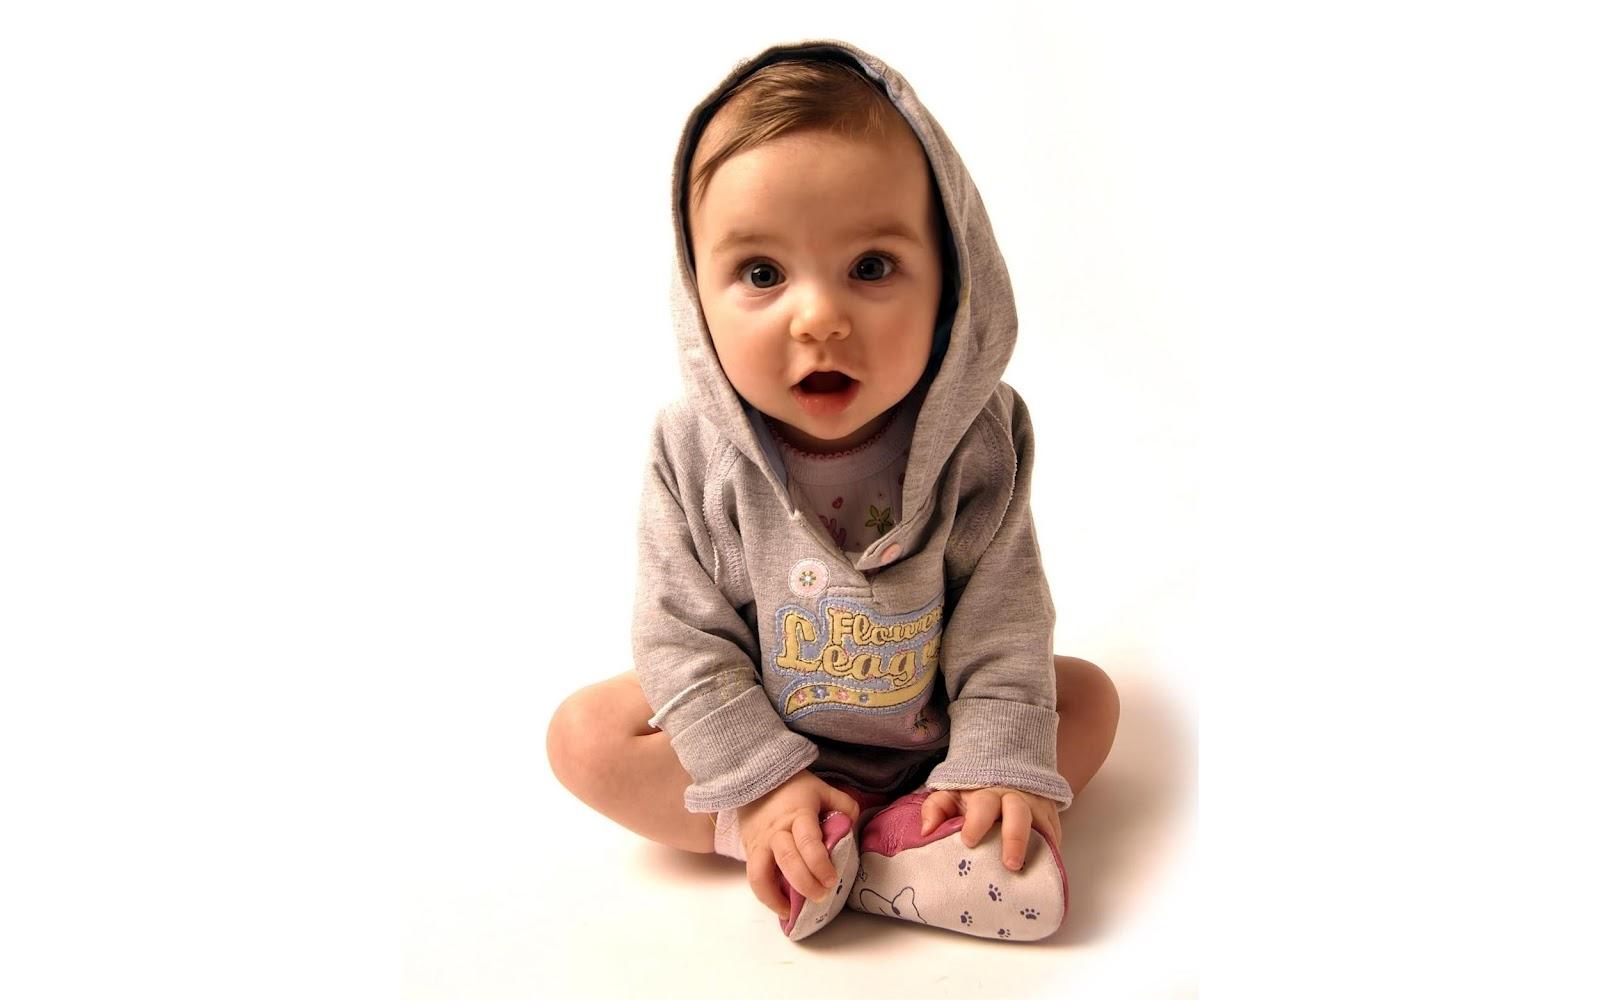 hd bebek resimleri rooteto+%25281%2529 30 En Güzel HD Kalite Bebek Resimleri moda_trend